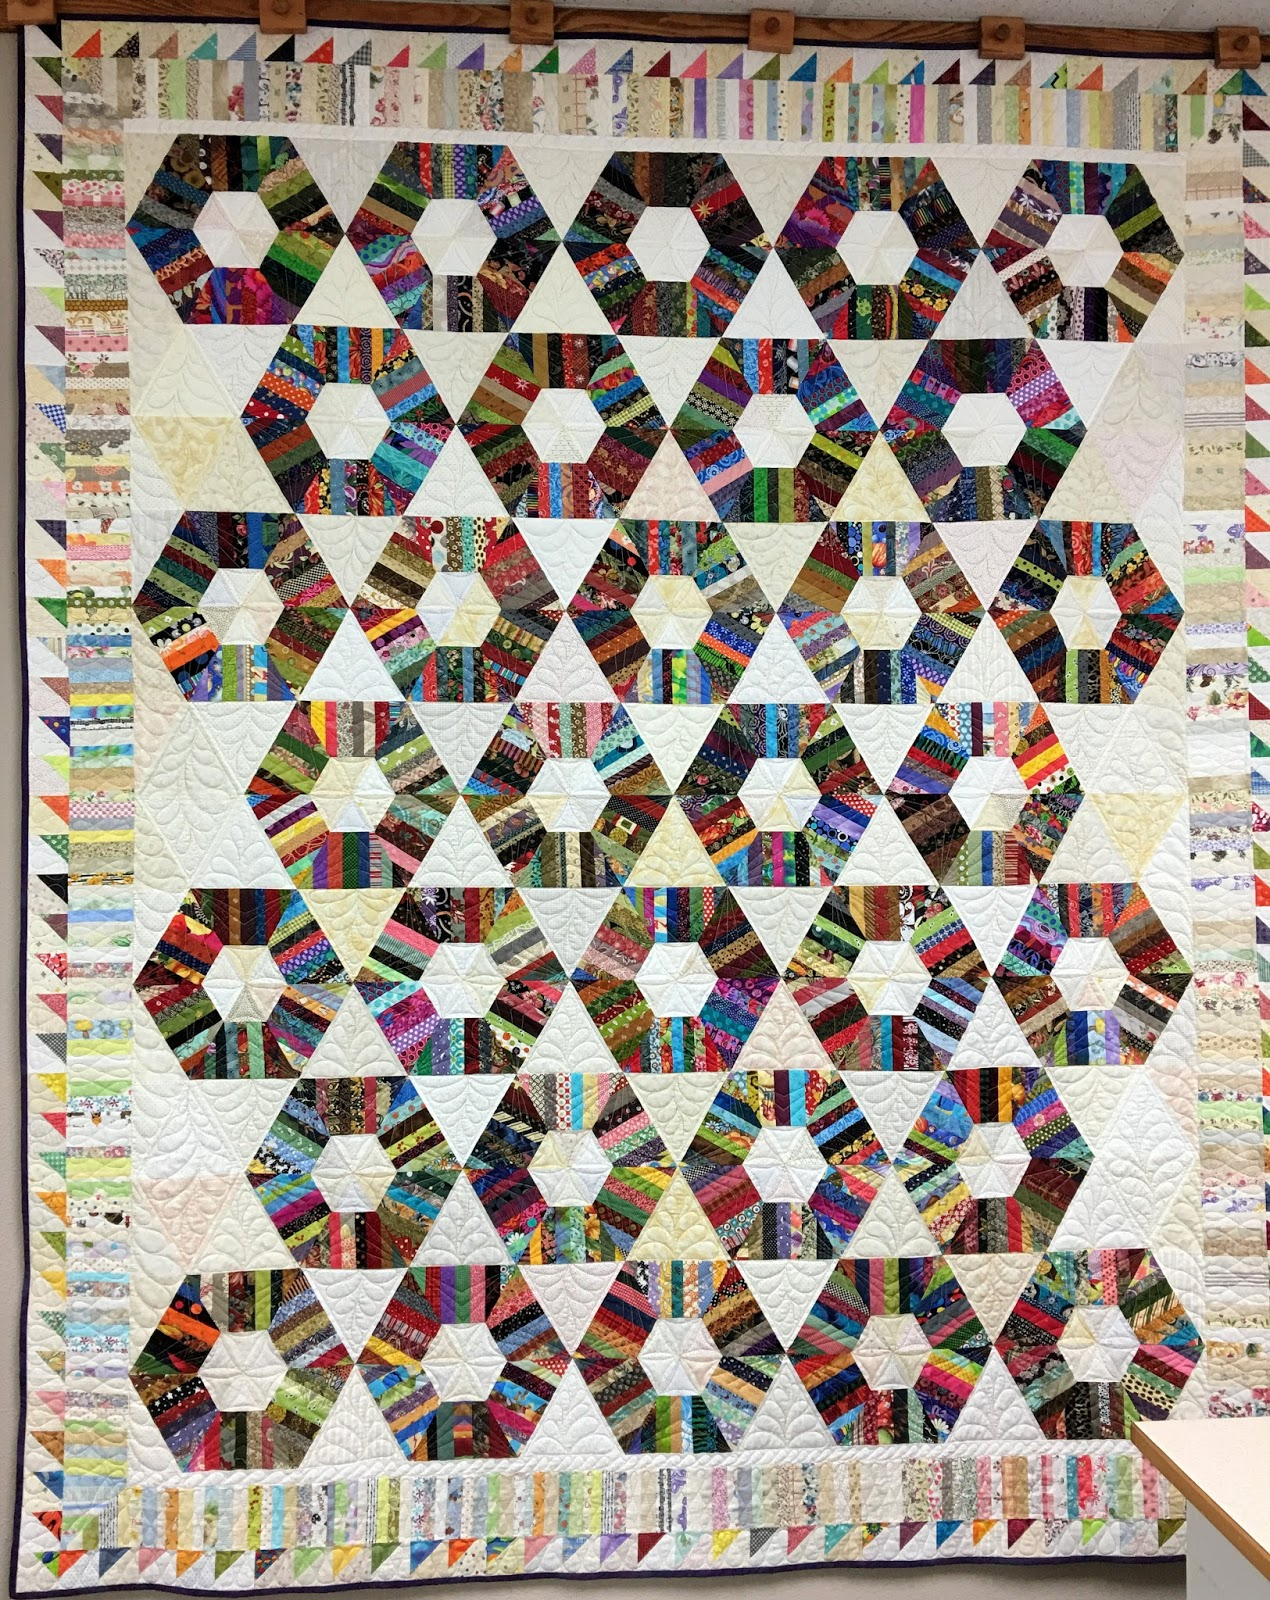 honeycomb quilt : honeycomb quilt - Adamdwight.com